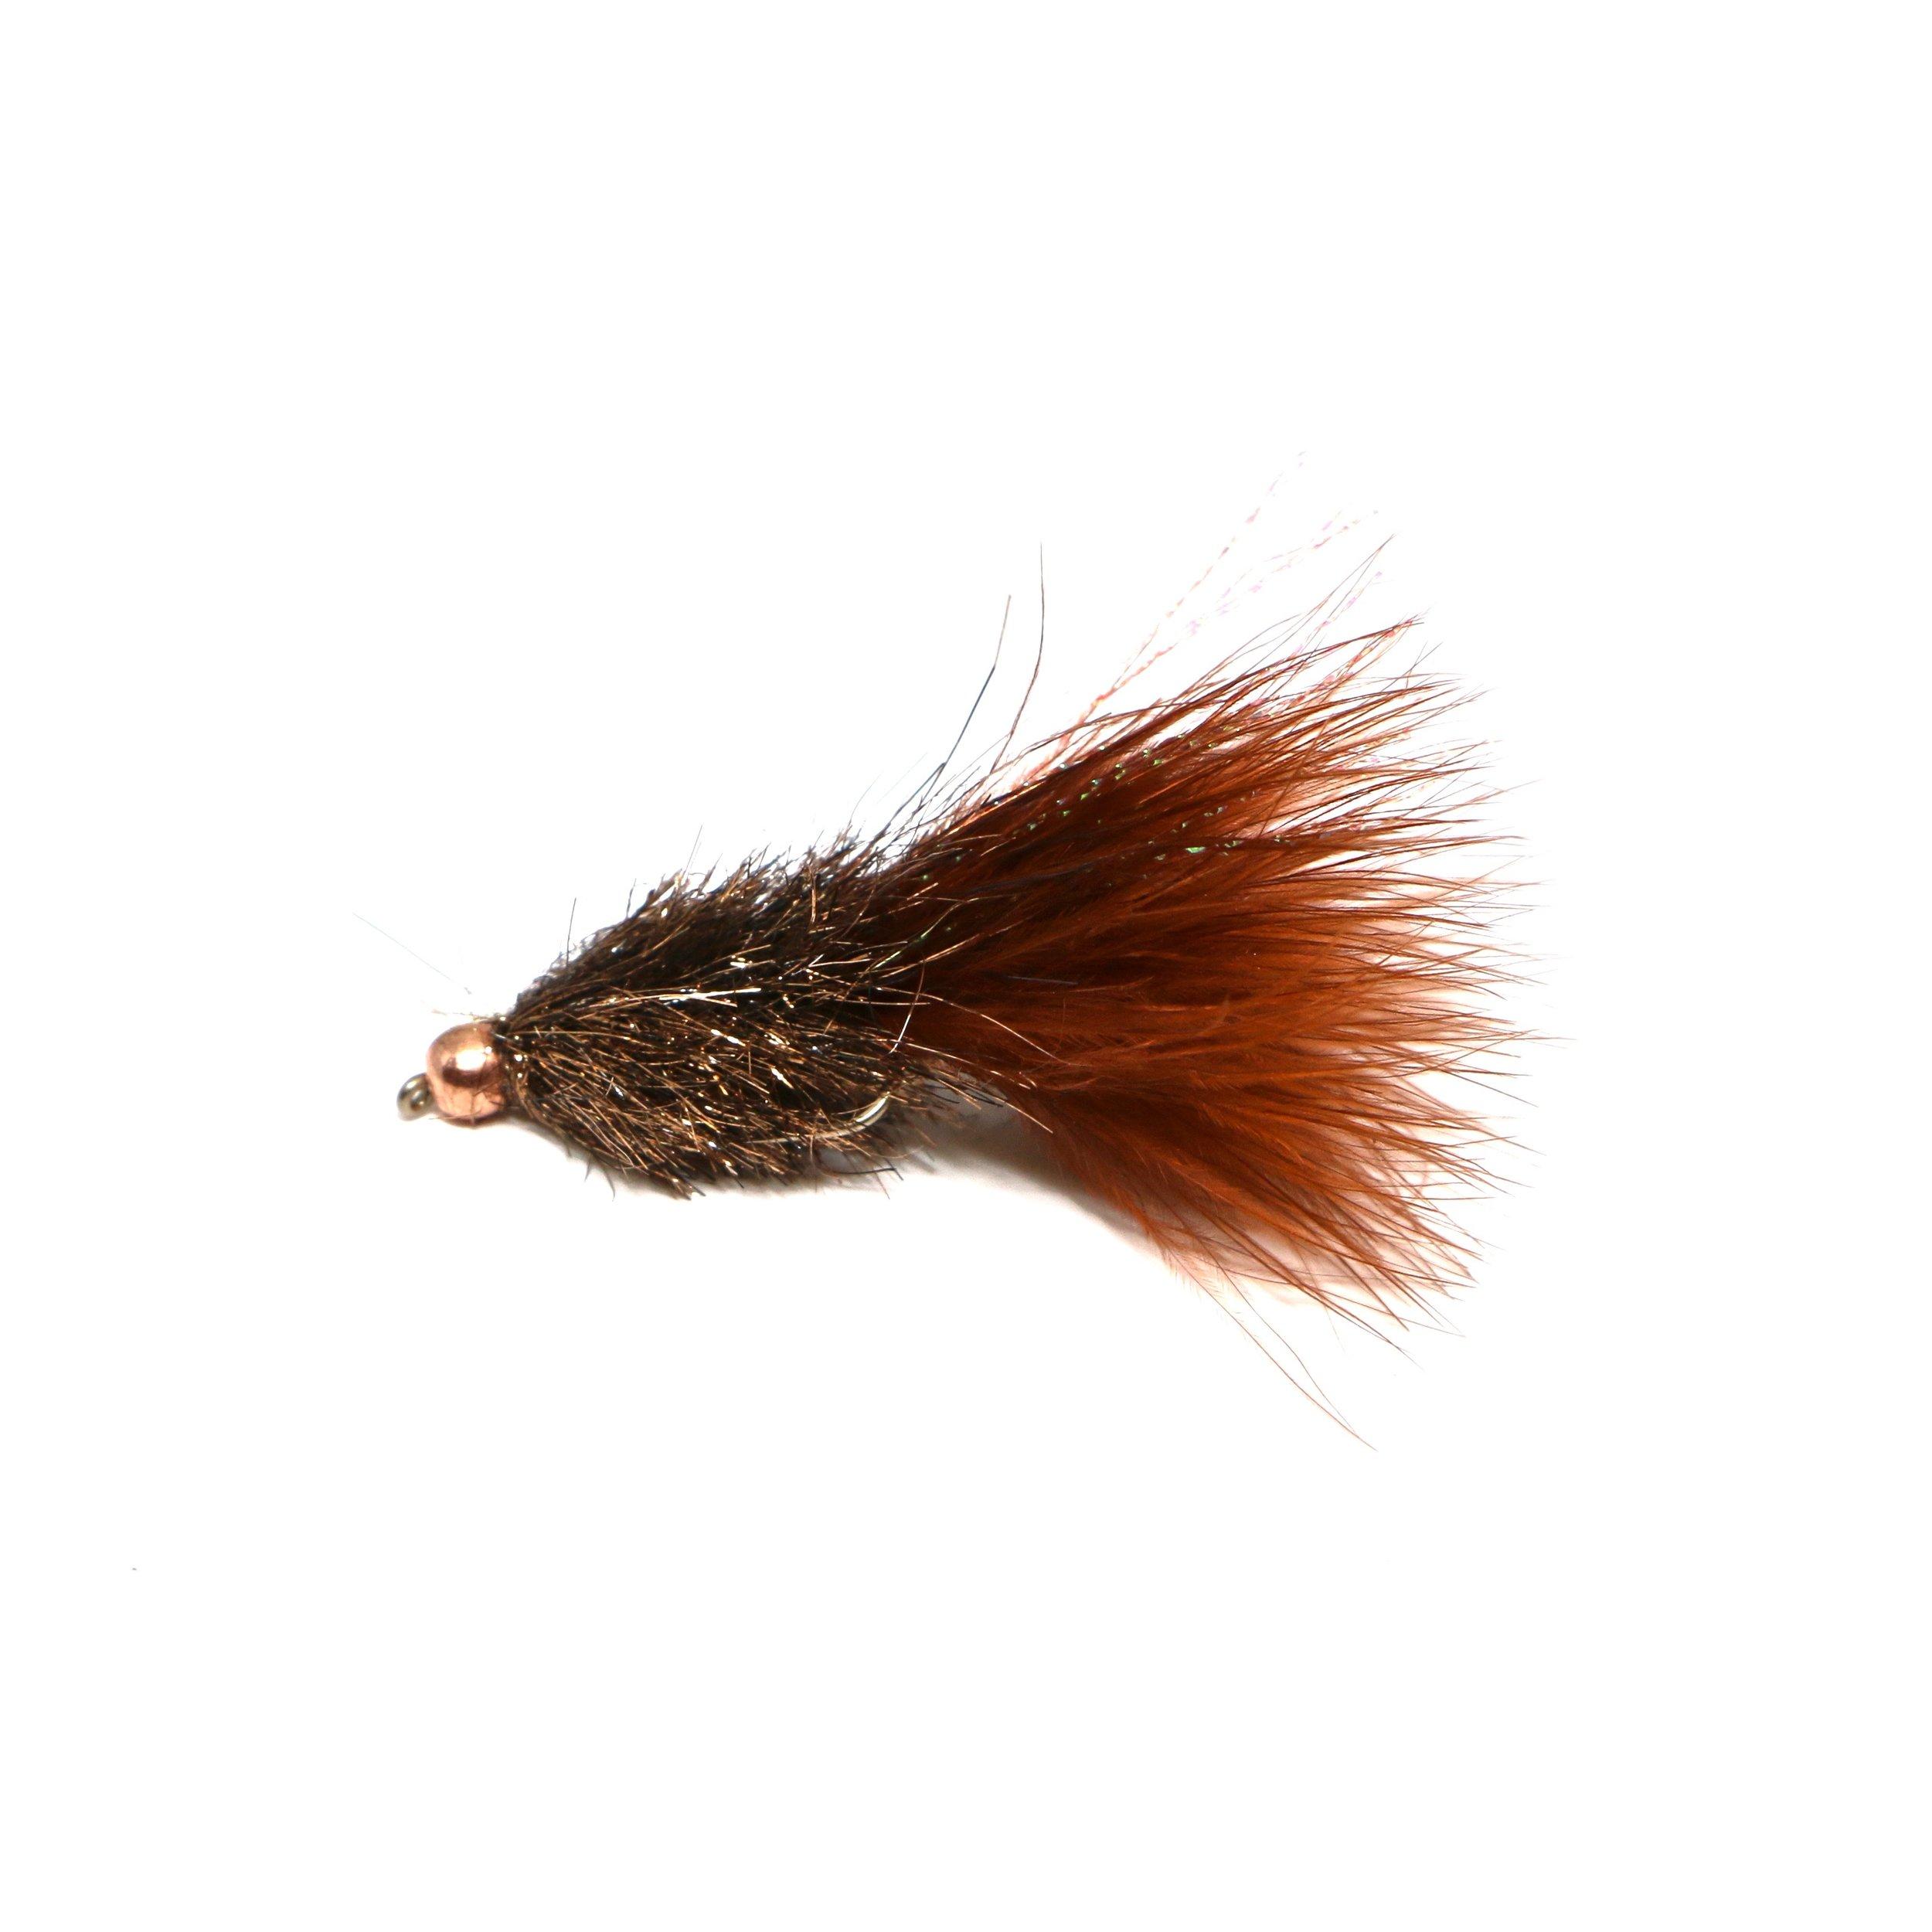 Coffreys Sparkle Minnow Brown:  https://ironbowflyshop.ca/collections/flies/products/coffeys-sparkle-minnow